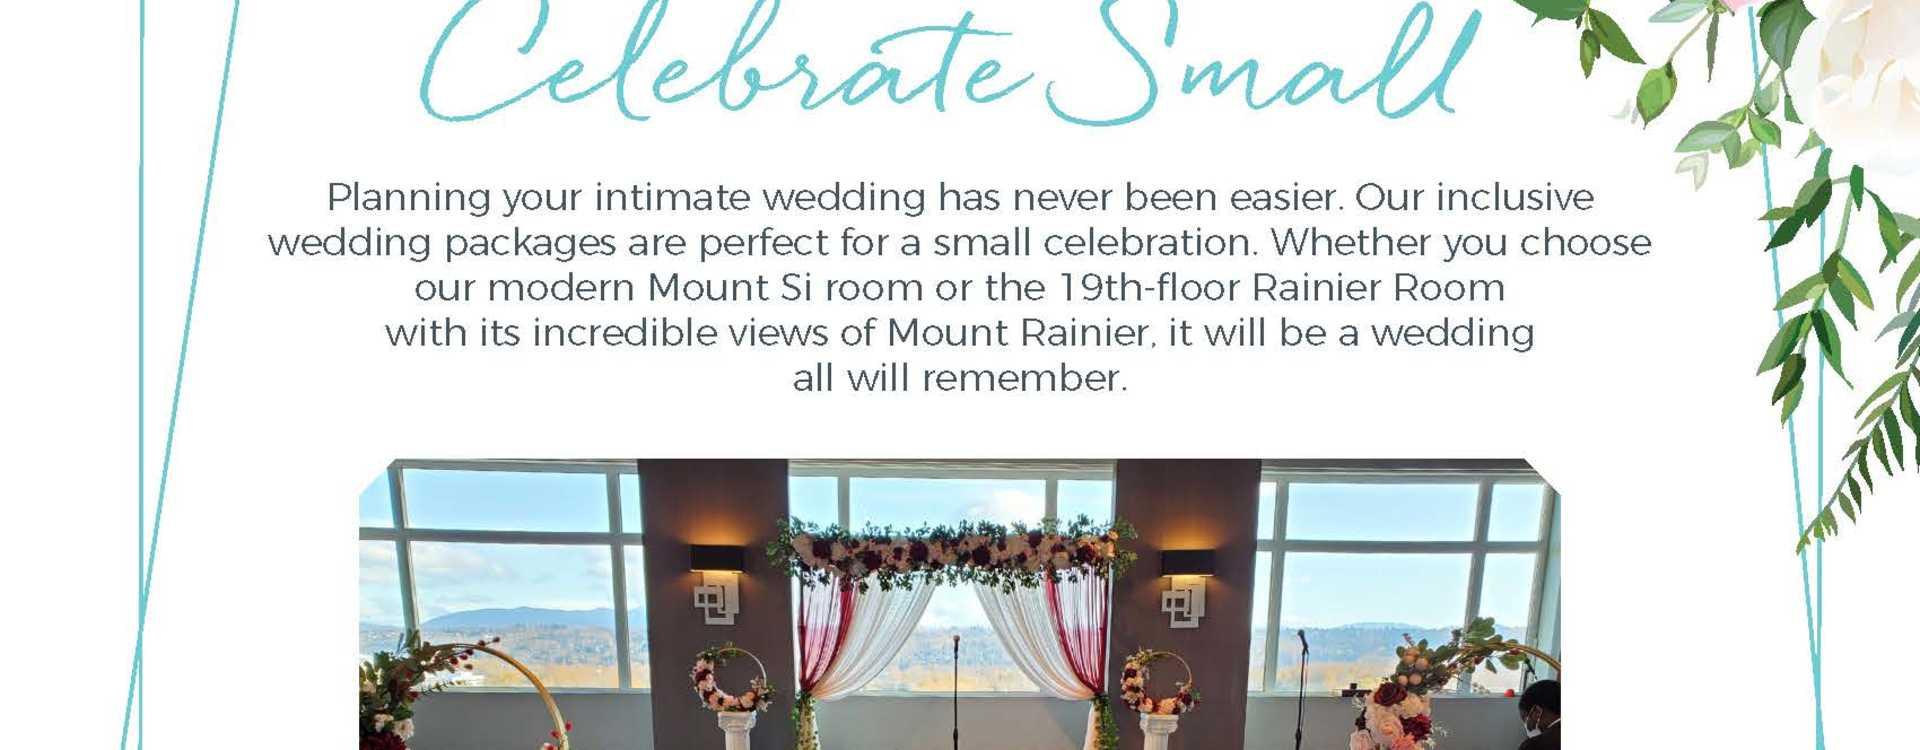 Hotel Interurban Celebrate Small Something Sweet Wedding